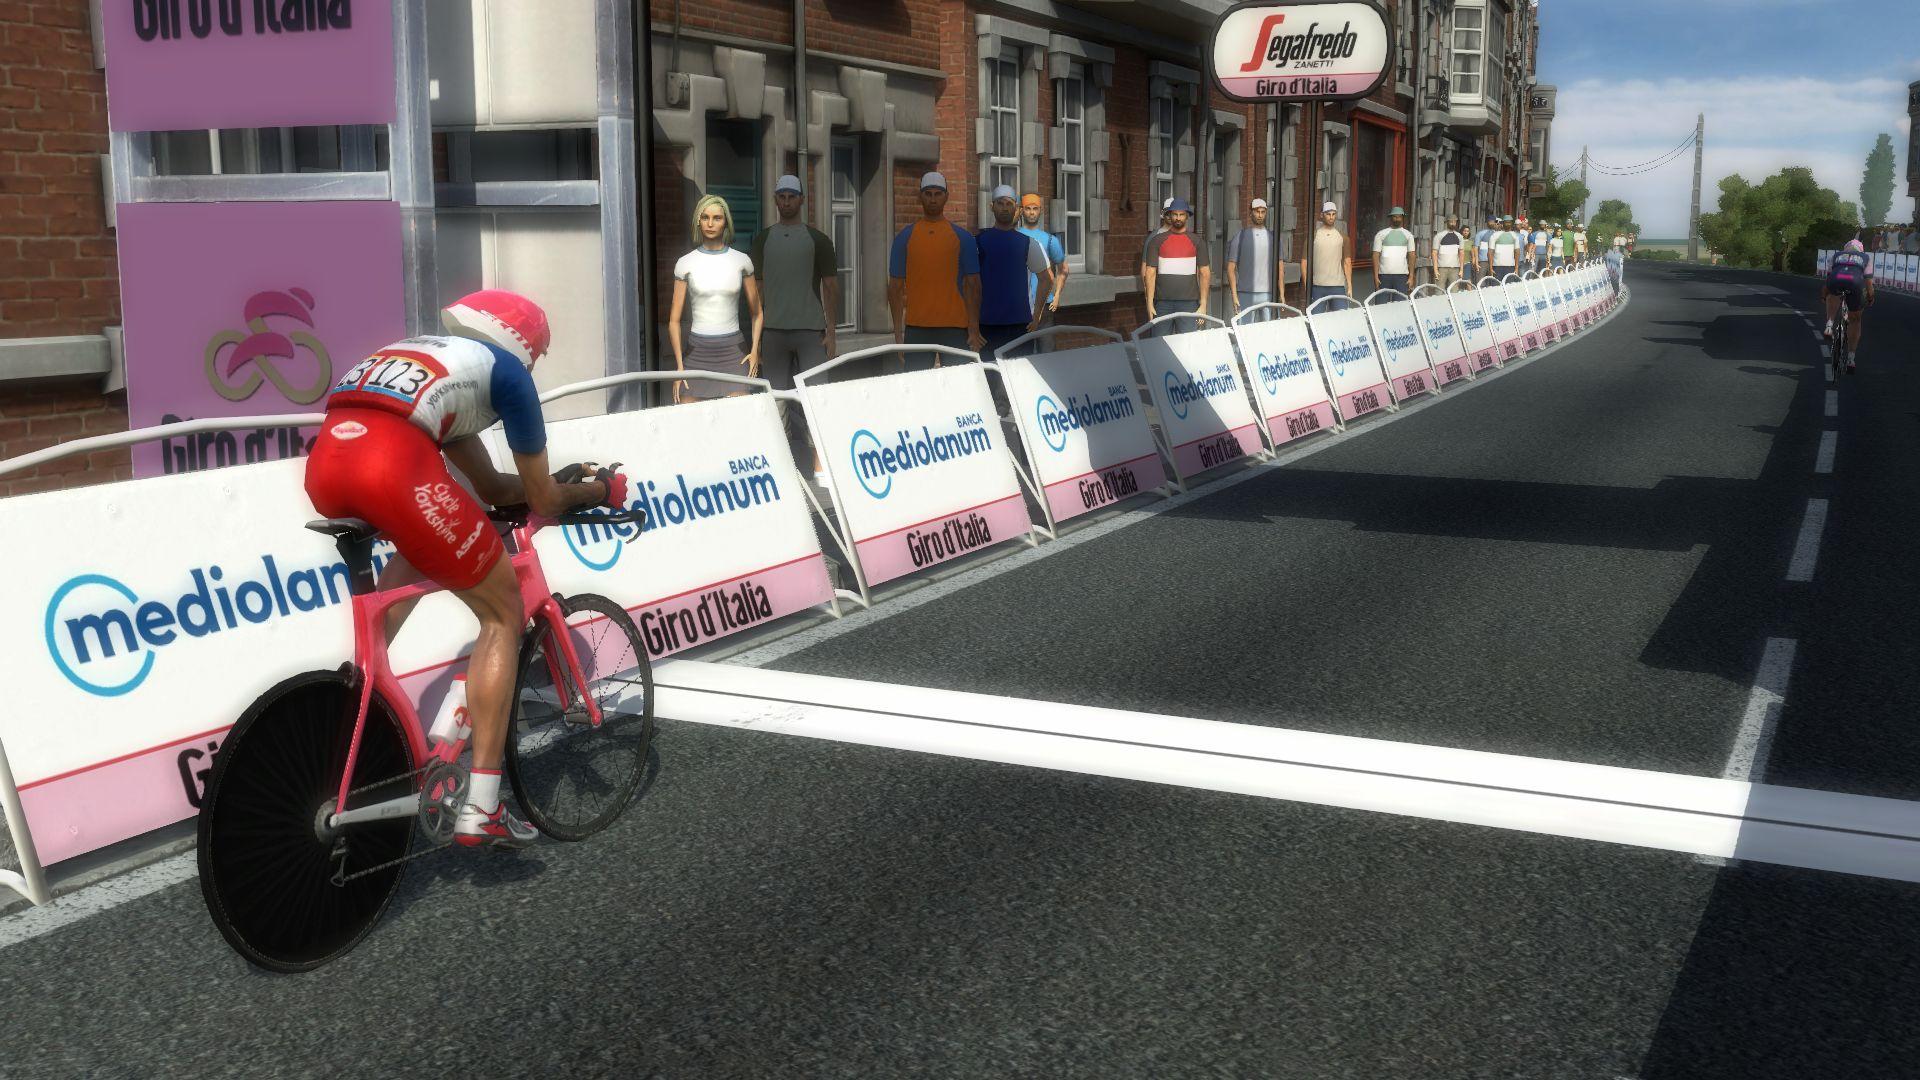 pcmdaily.com/images/mg/2020/Reports/GTM/Giro/S14/mg20_giro_s14_33.jpg